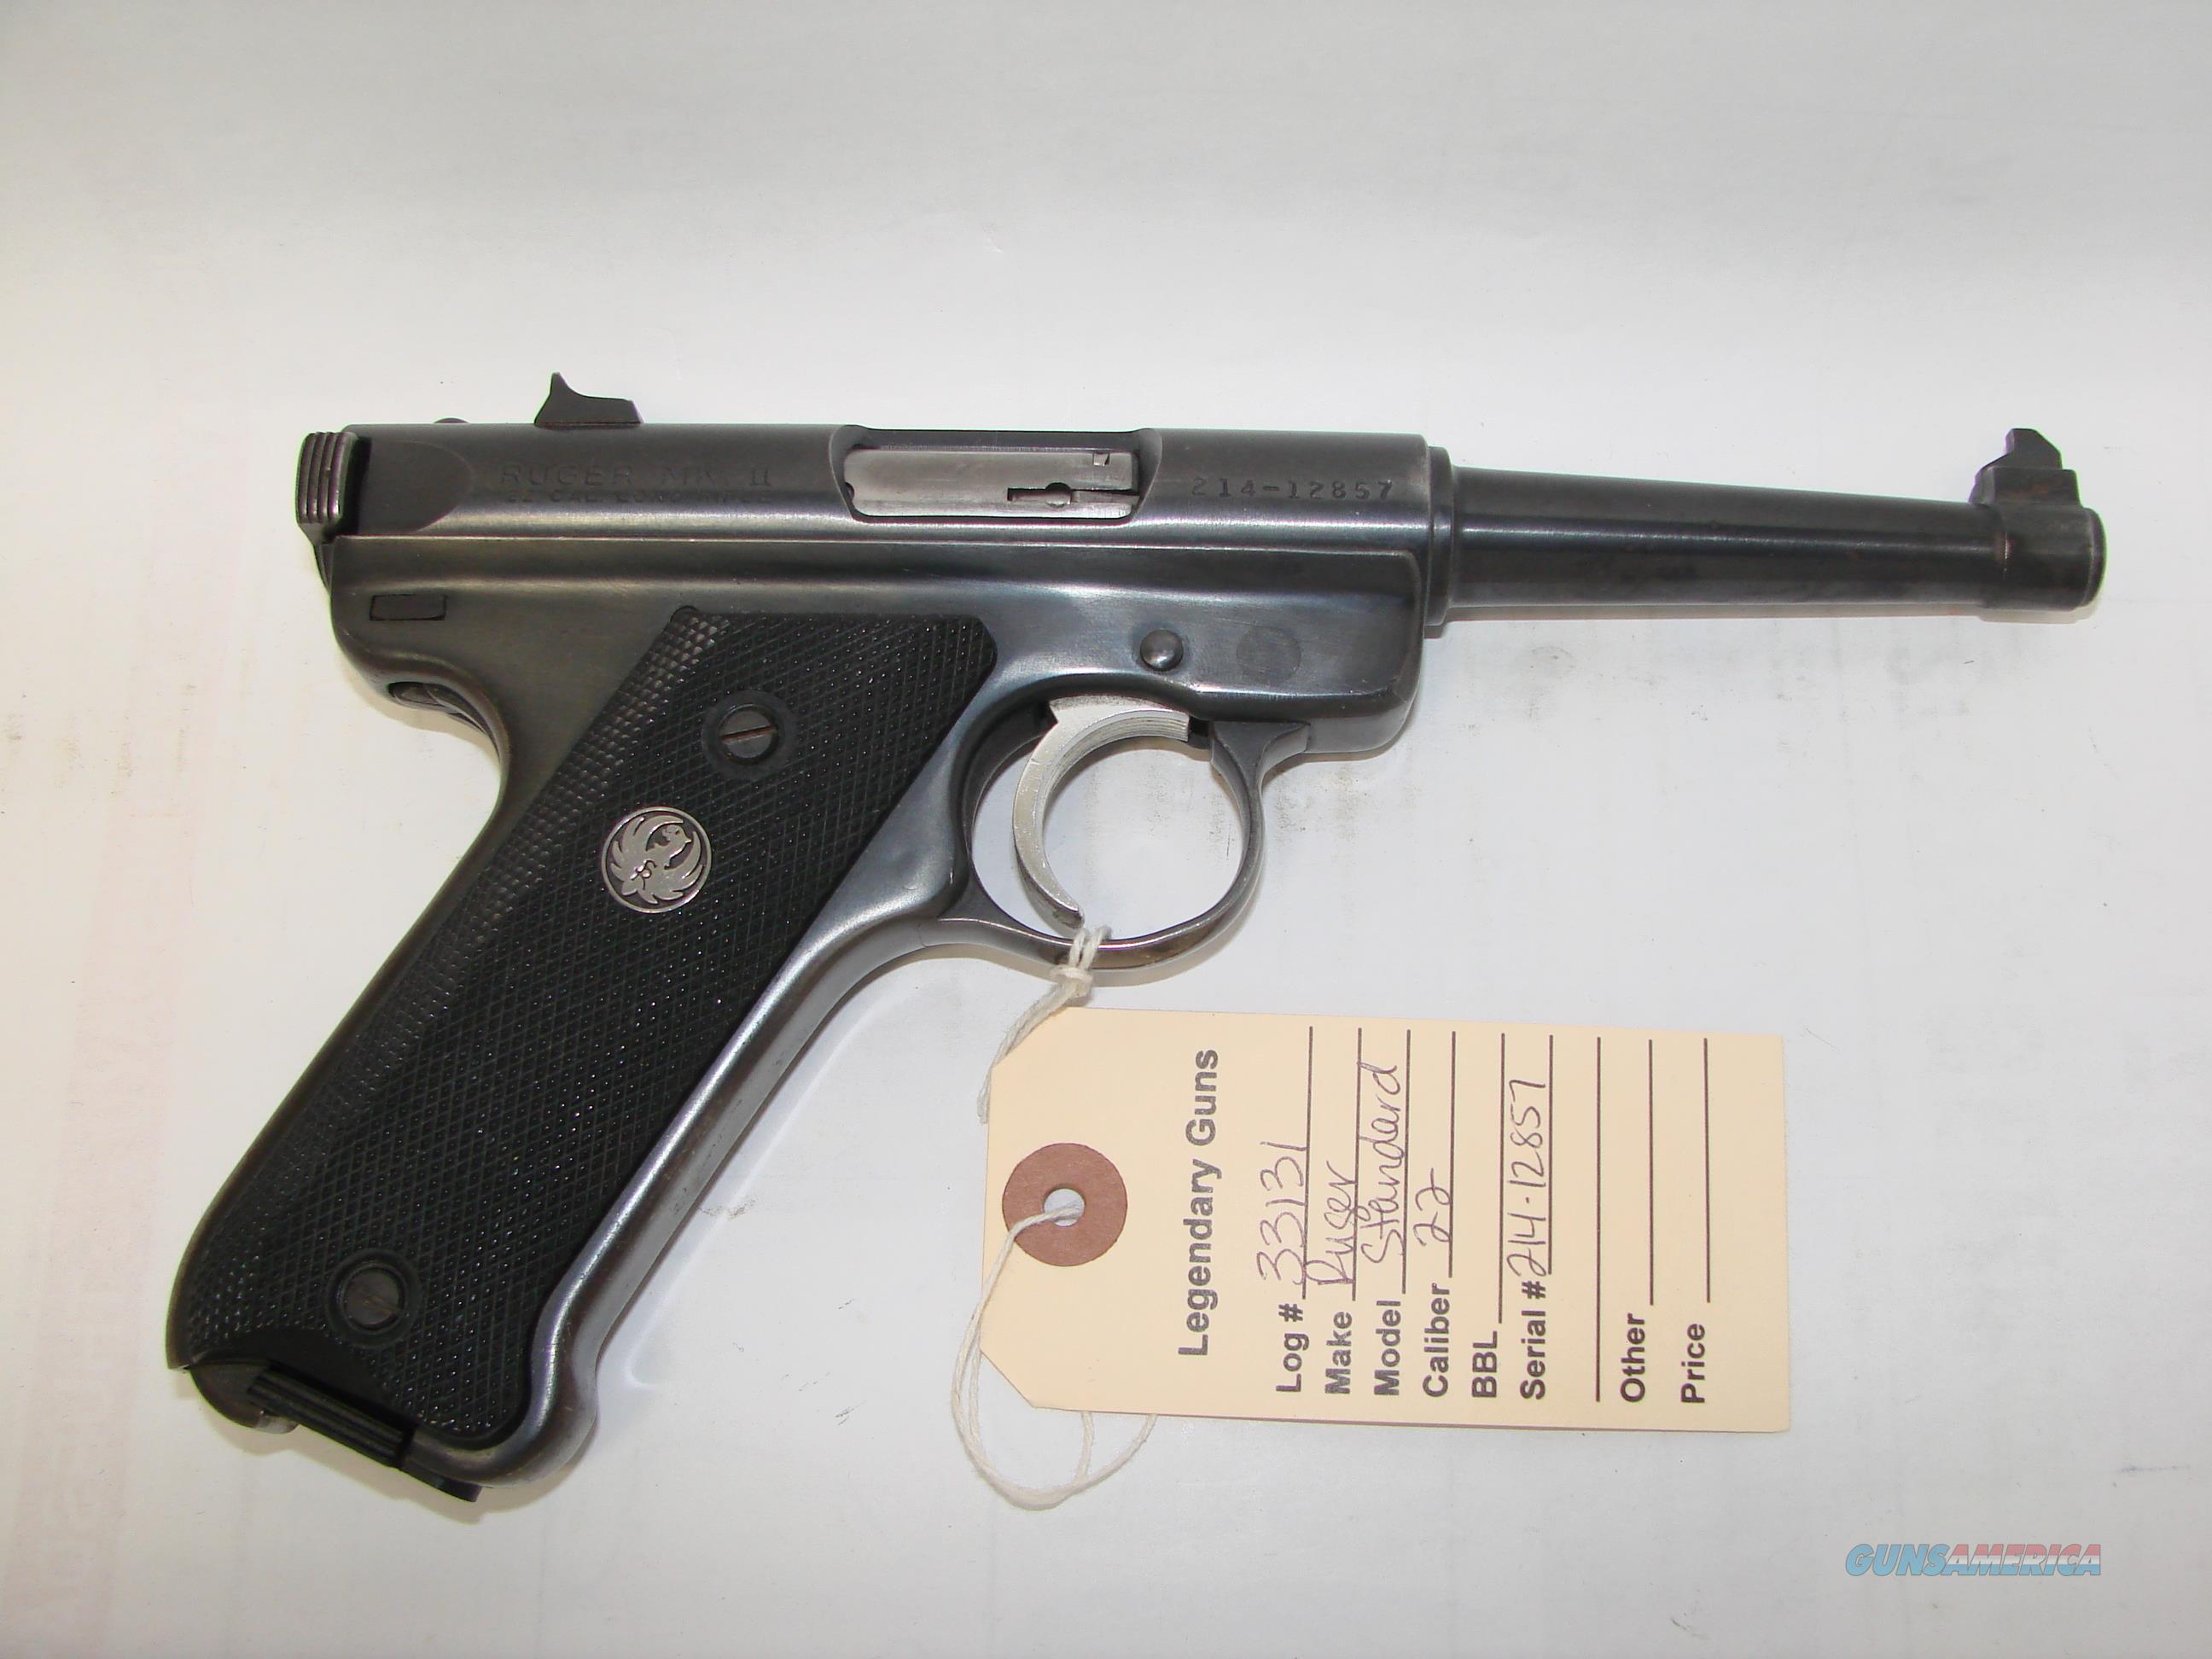 Ruger Mk II  Guns > Pistols > Ruger Semi-Auto Pistols > Mark I/II/III/IV Family